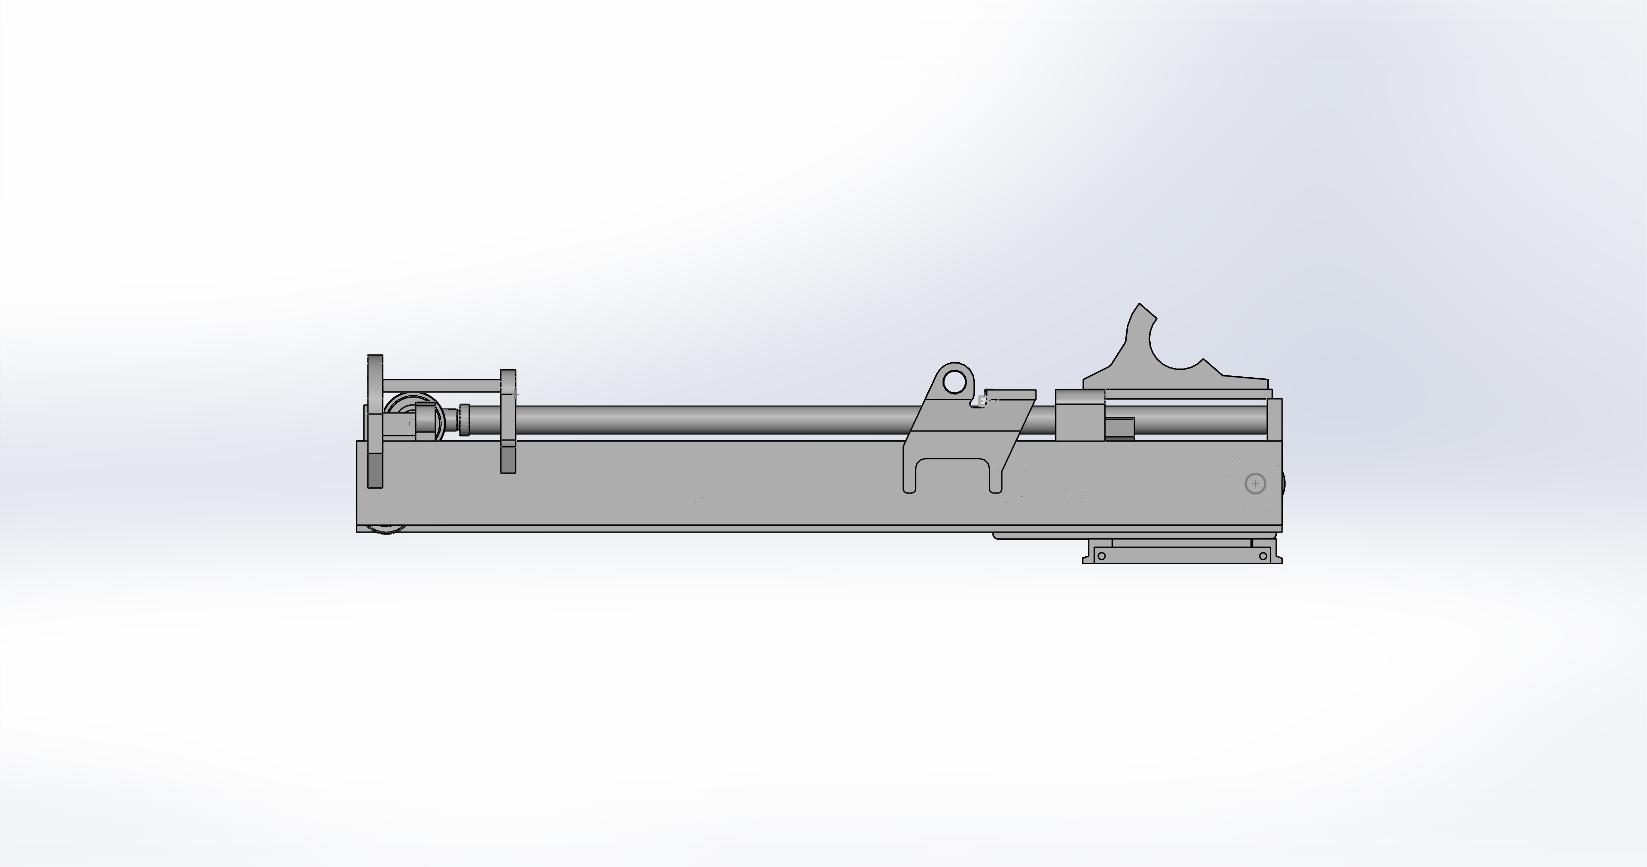 Axon Forklift: Three Stage Mast-3